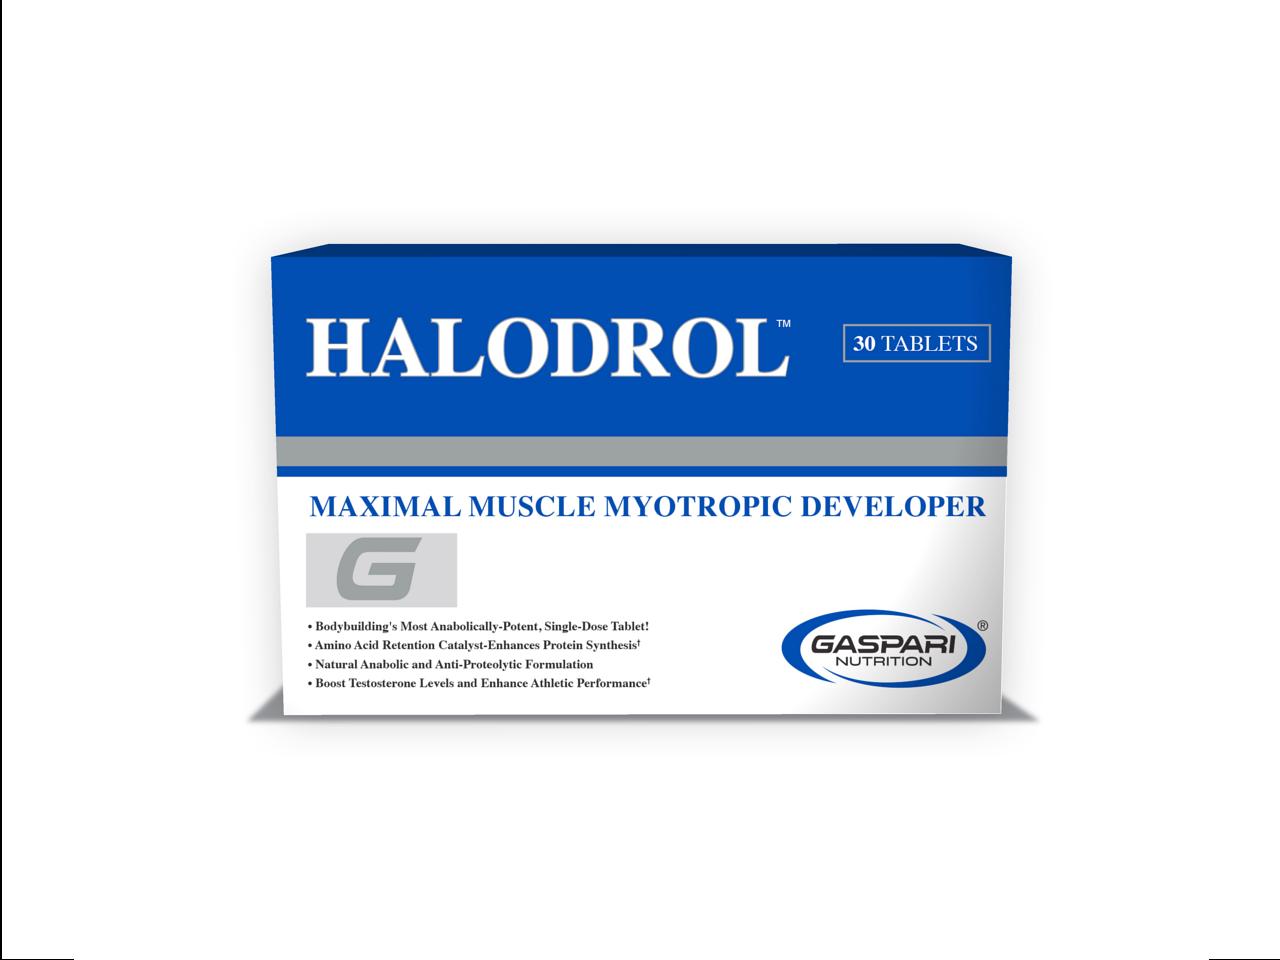 Halodrol 50 gaspari nutrition